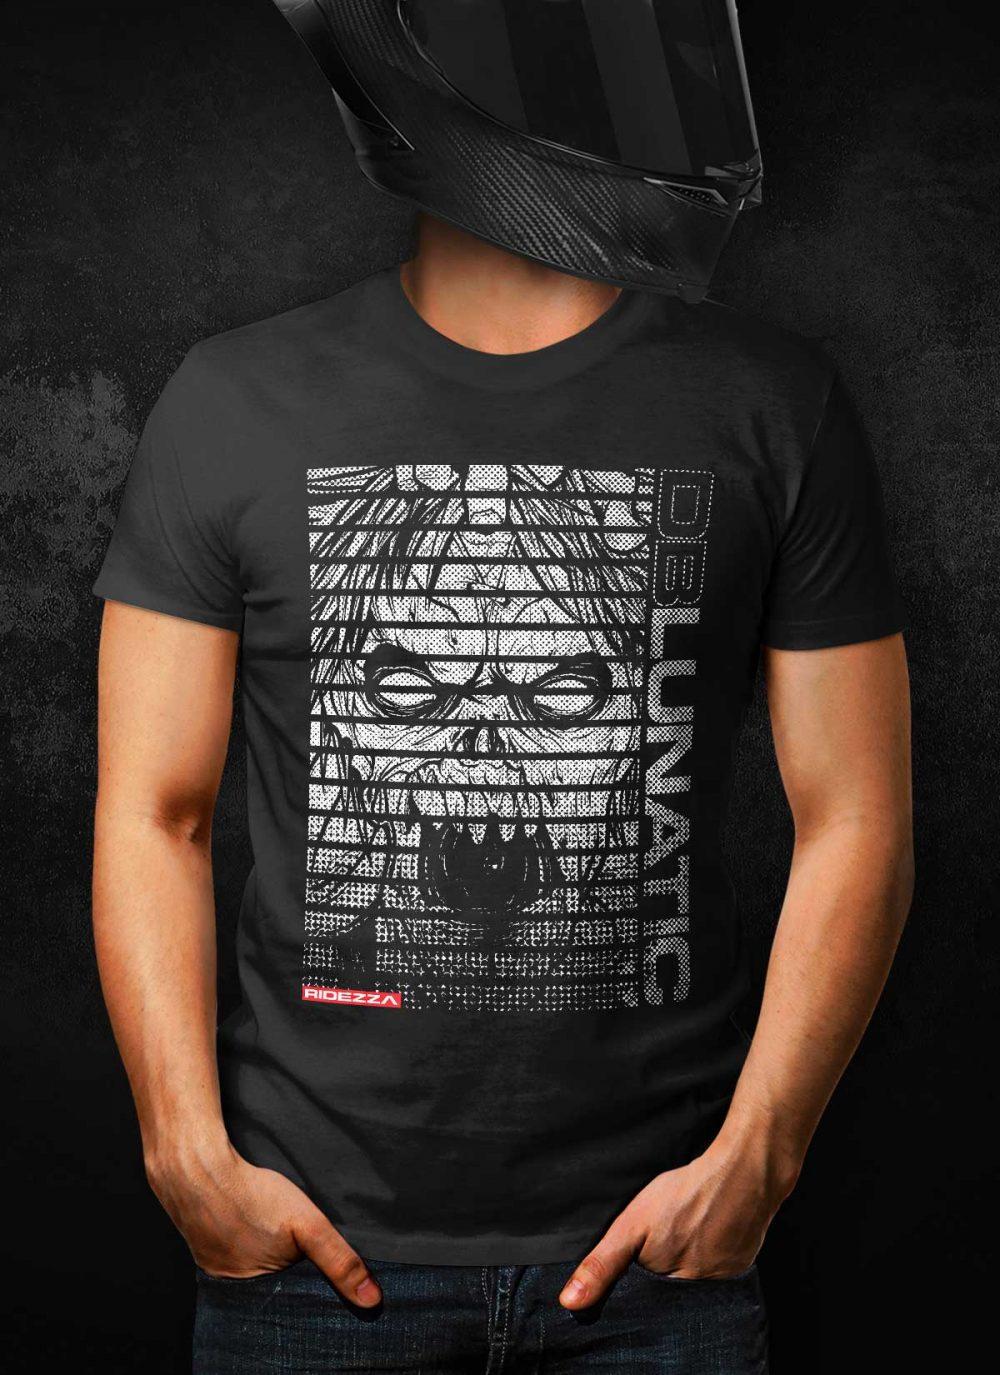 Dirtbike Lunatic Society T-Shirt